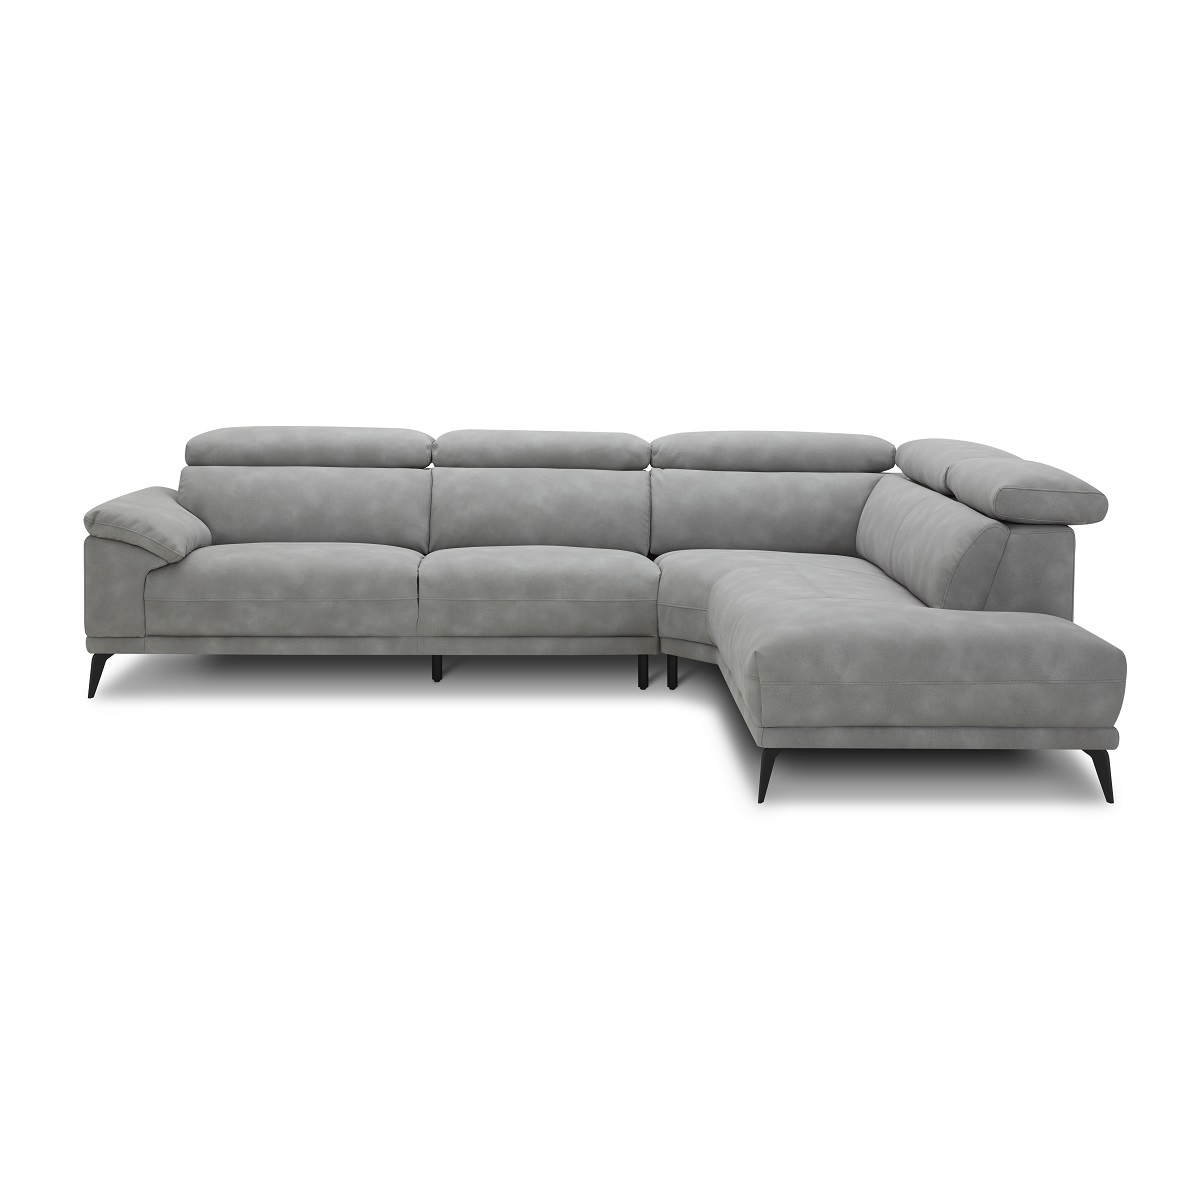 Montero RHF Corner Sofa - Grey